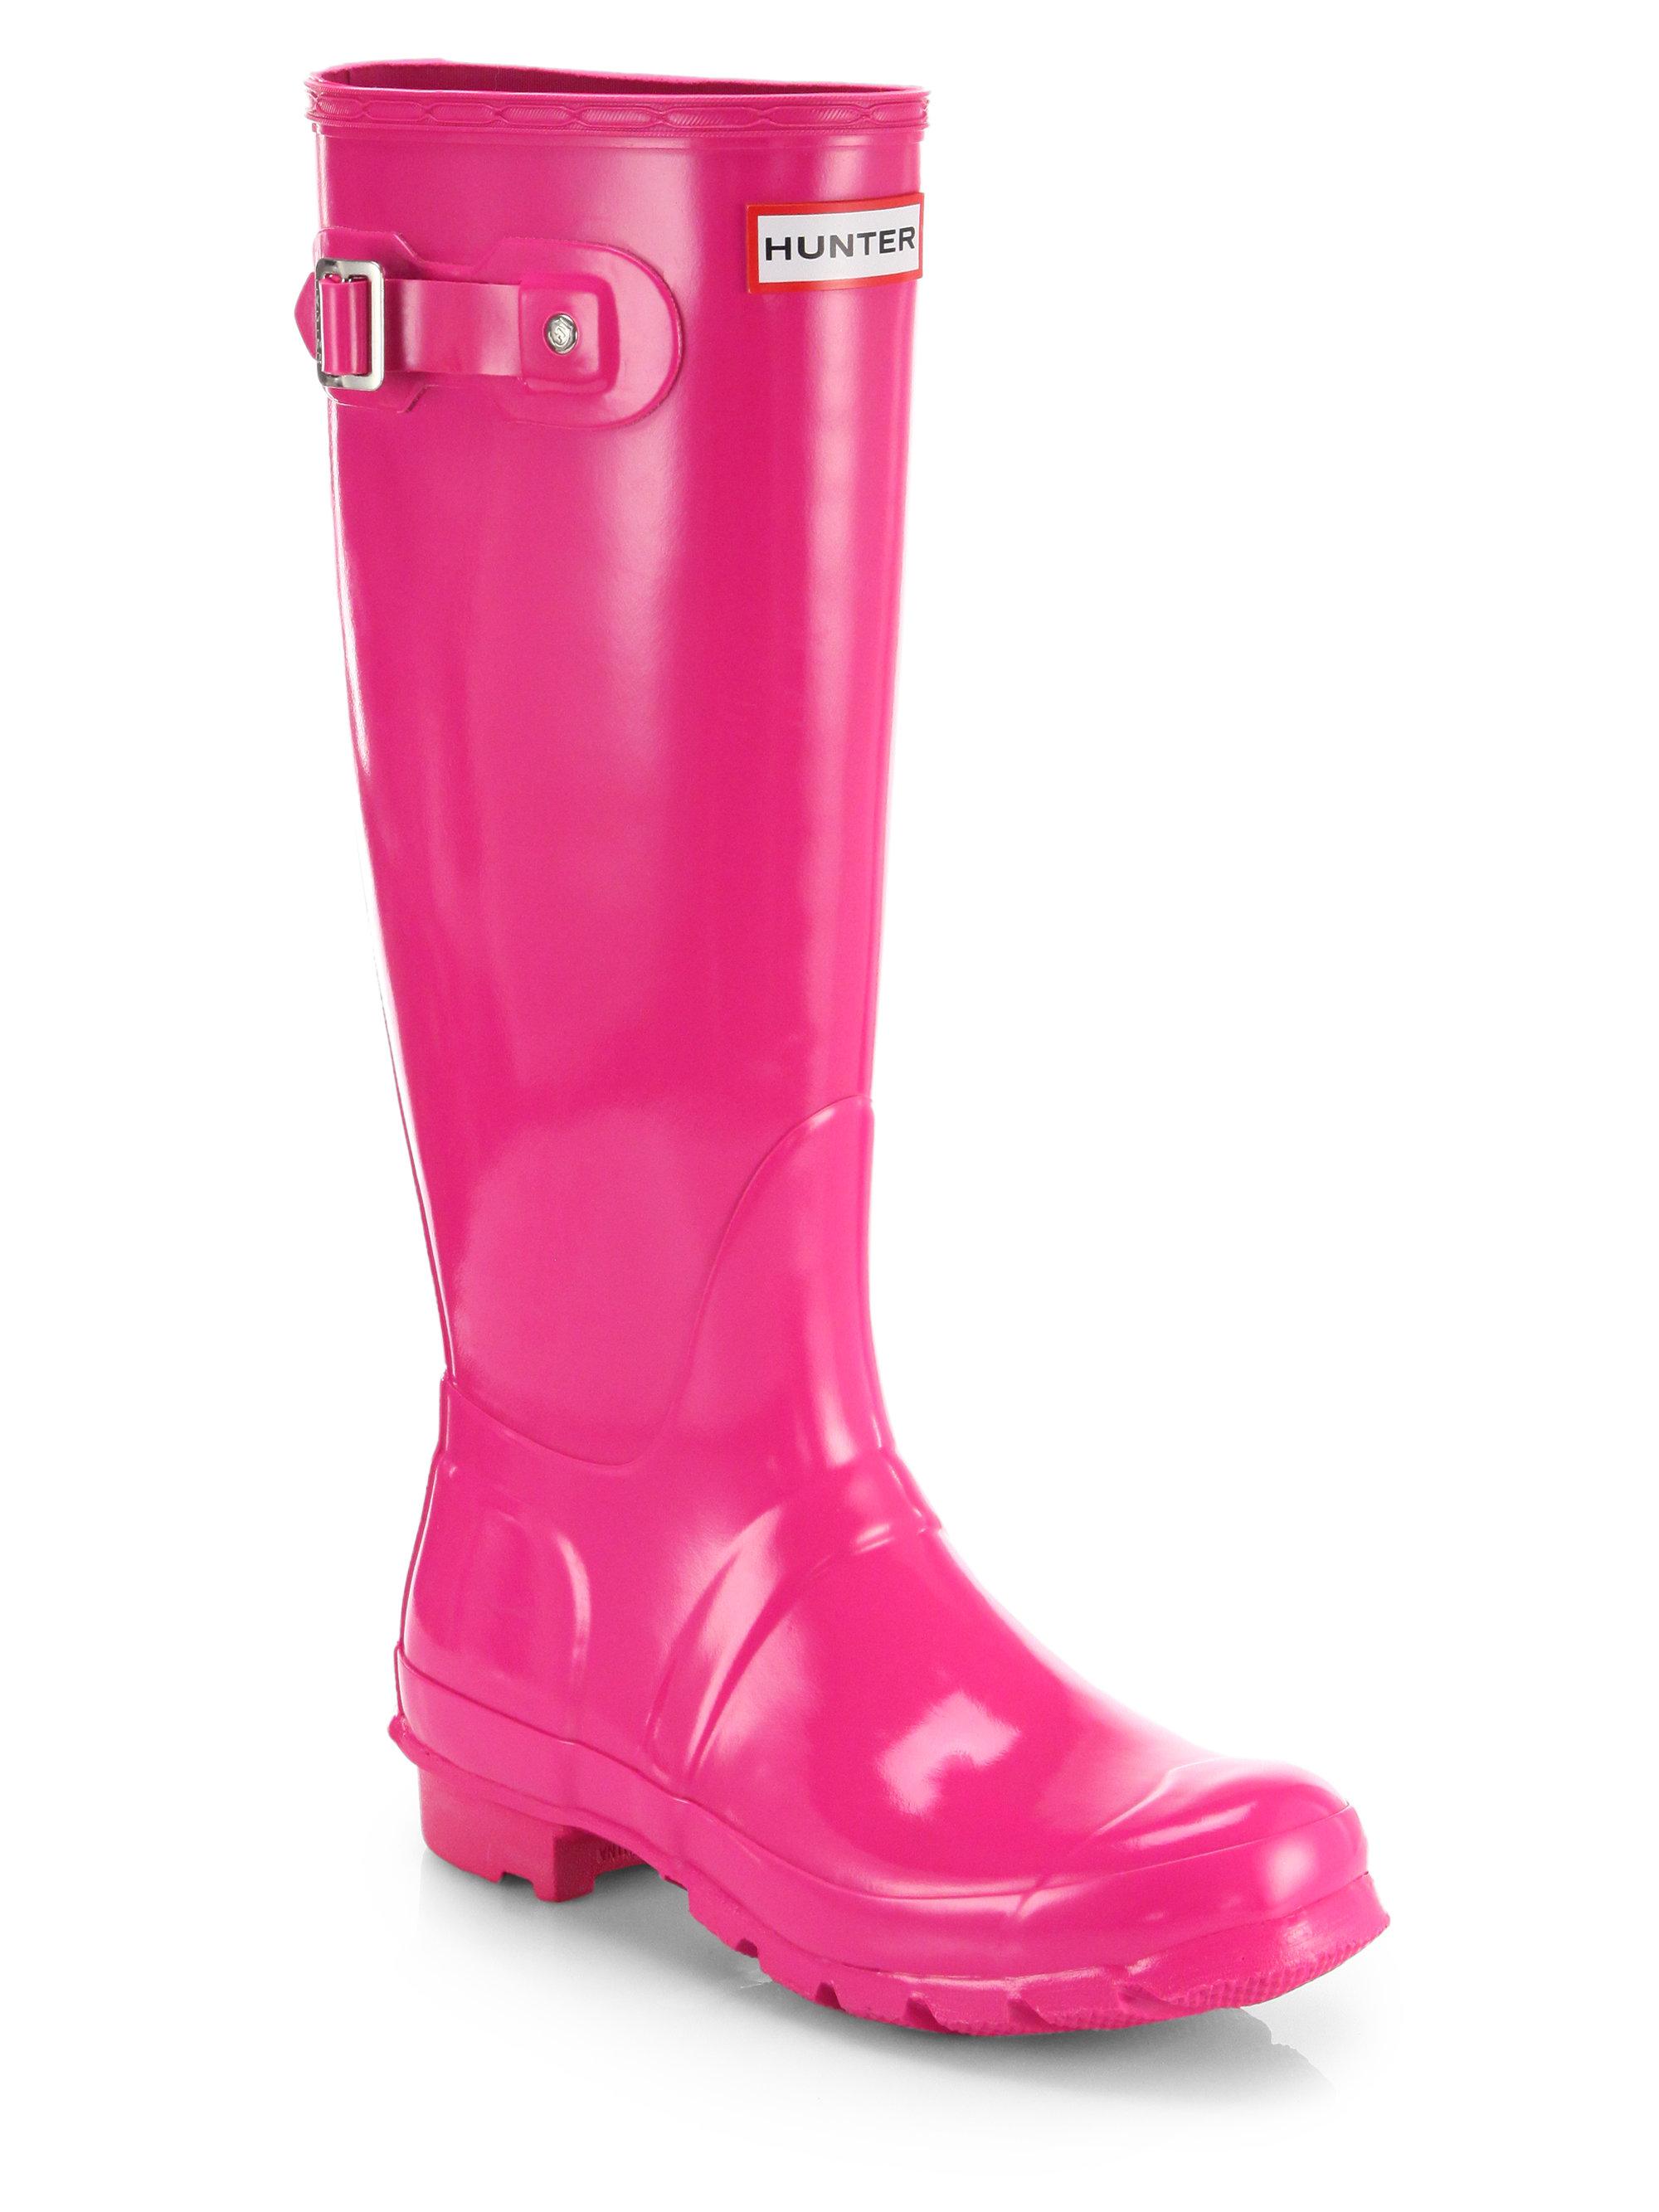 hunter gloss finish original rain boots in pink lyst. Black Bedroom Furniture Sets. Home Design Ideas